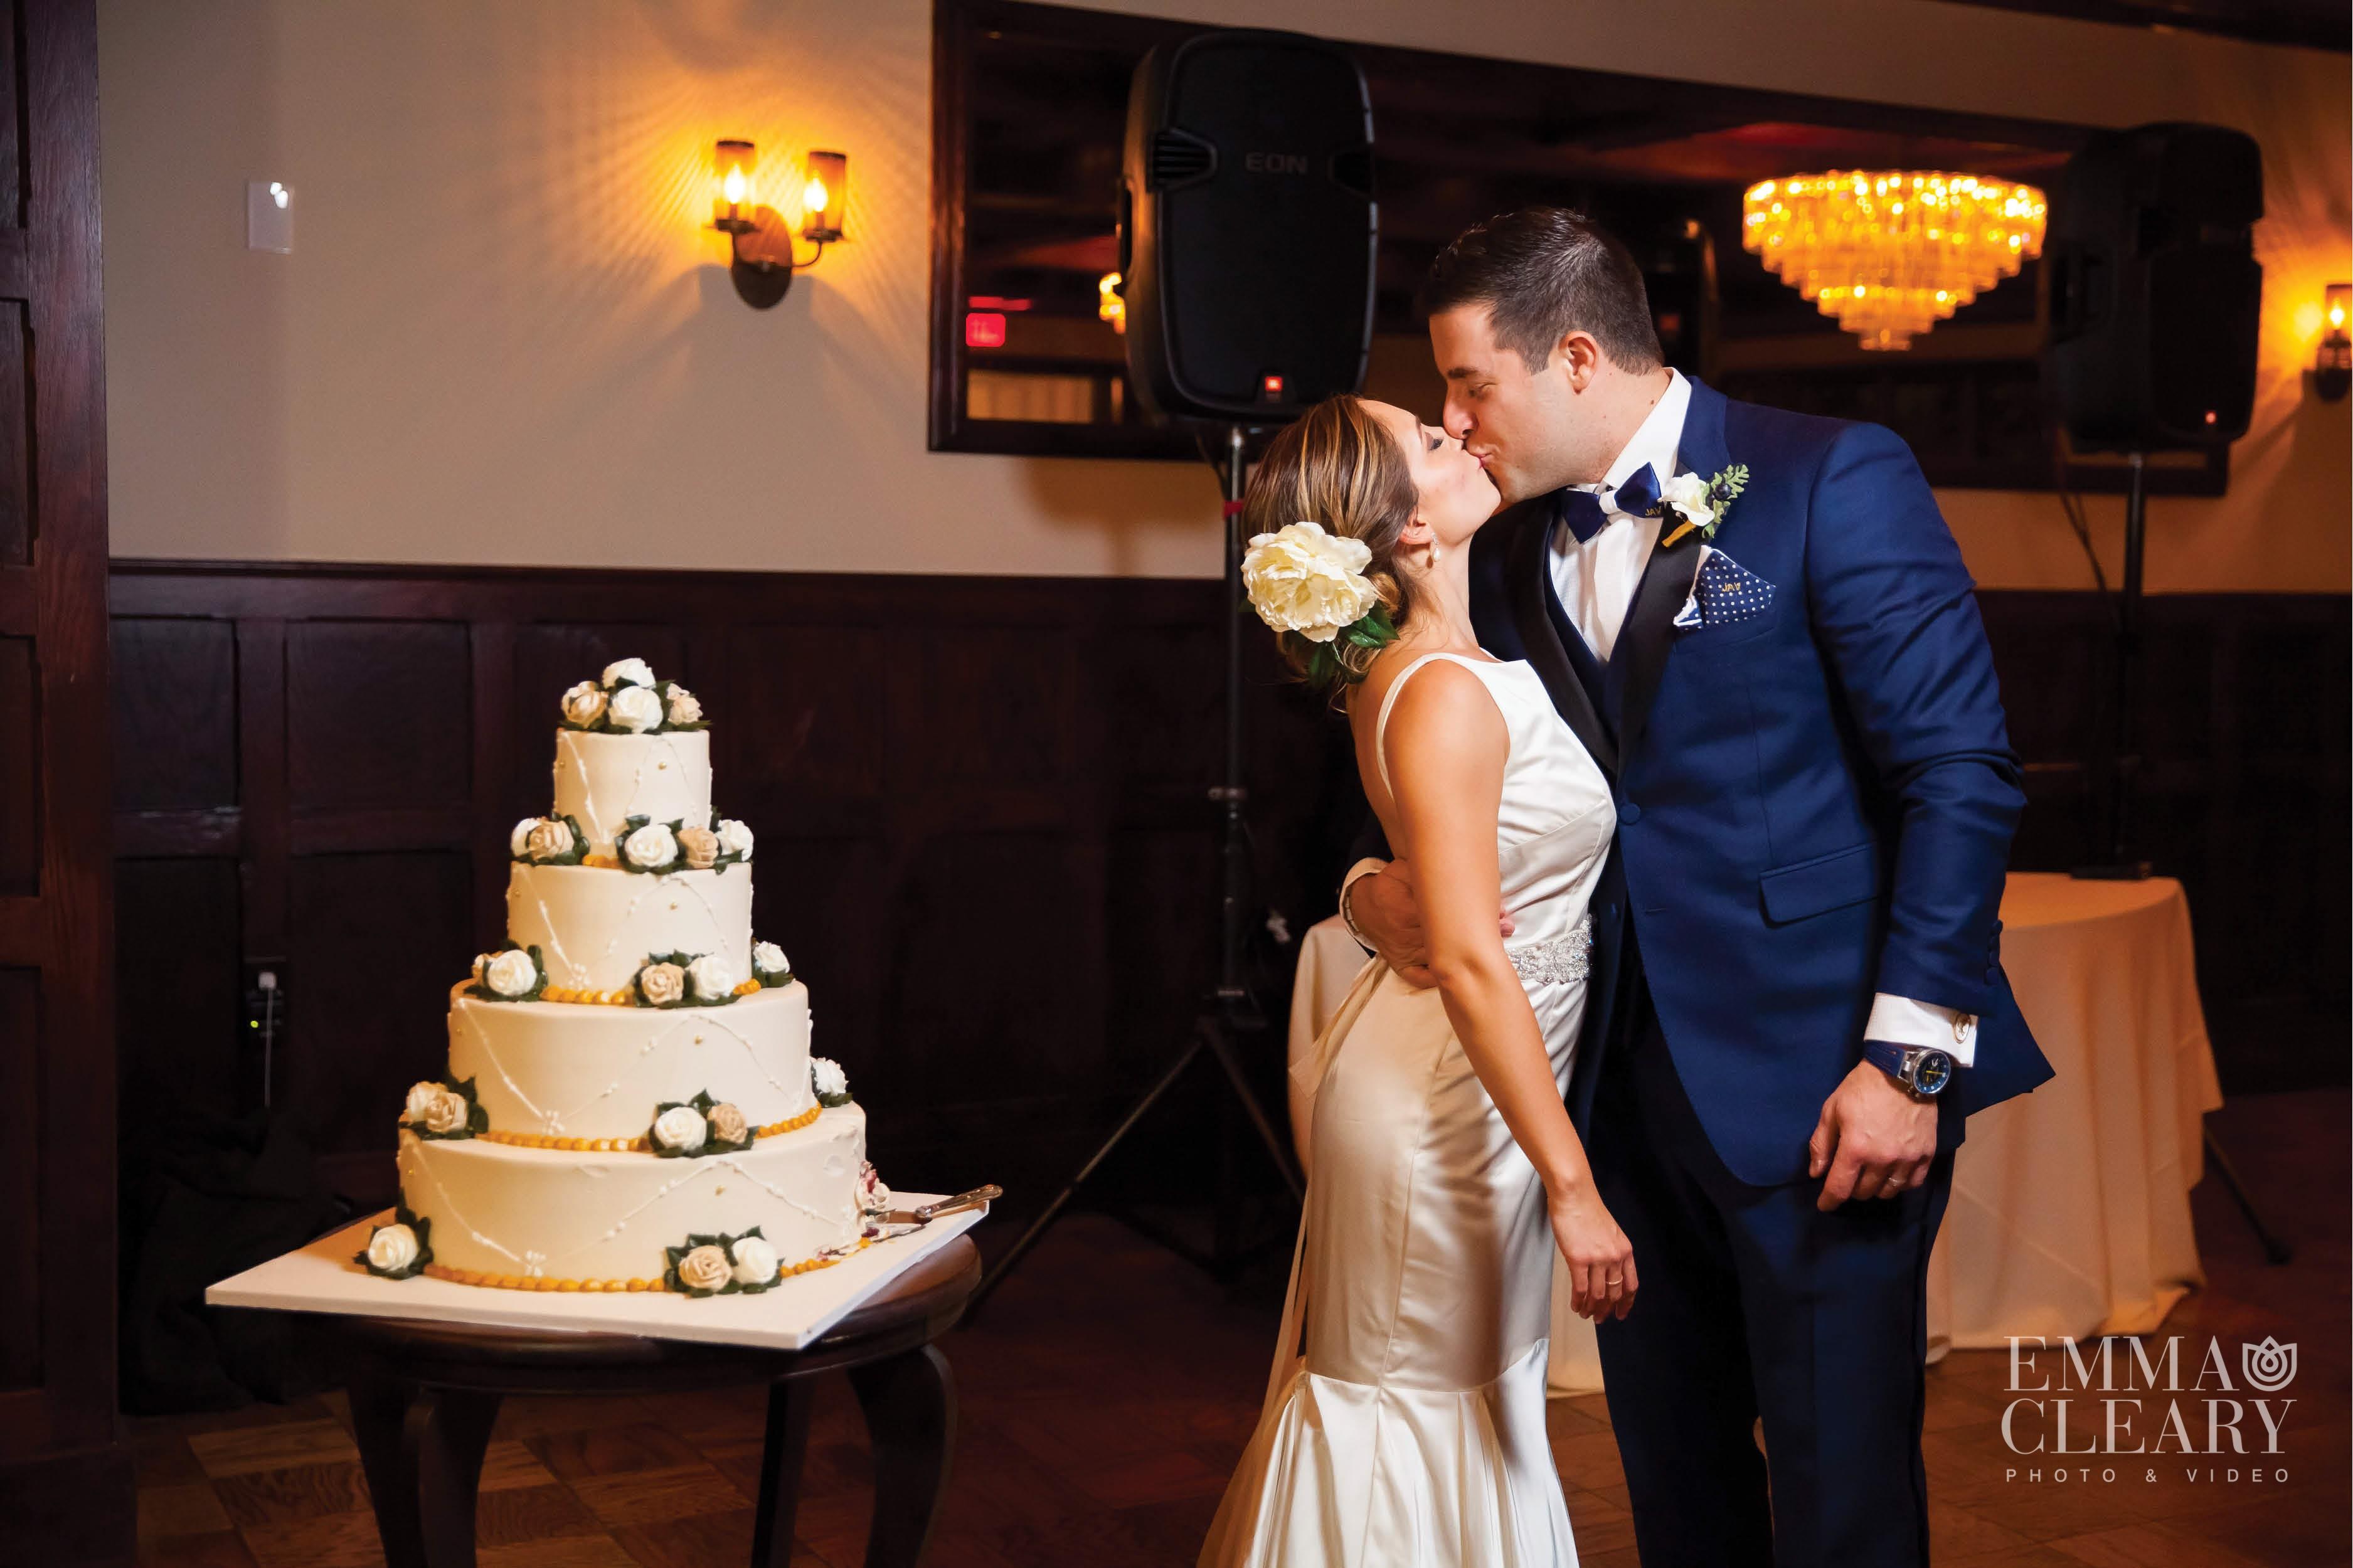 emma_cleary_photography-hotel-du-village-wedding27